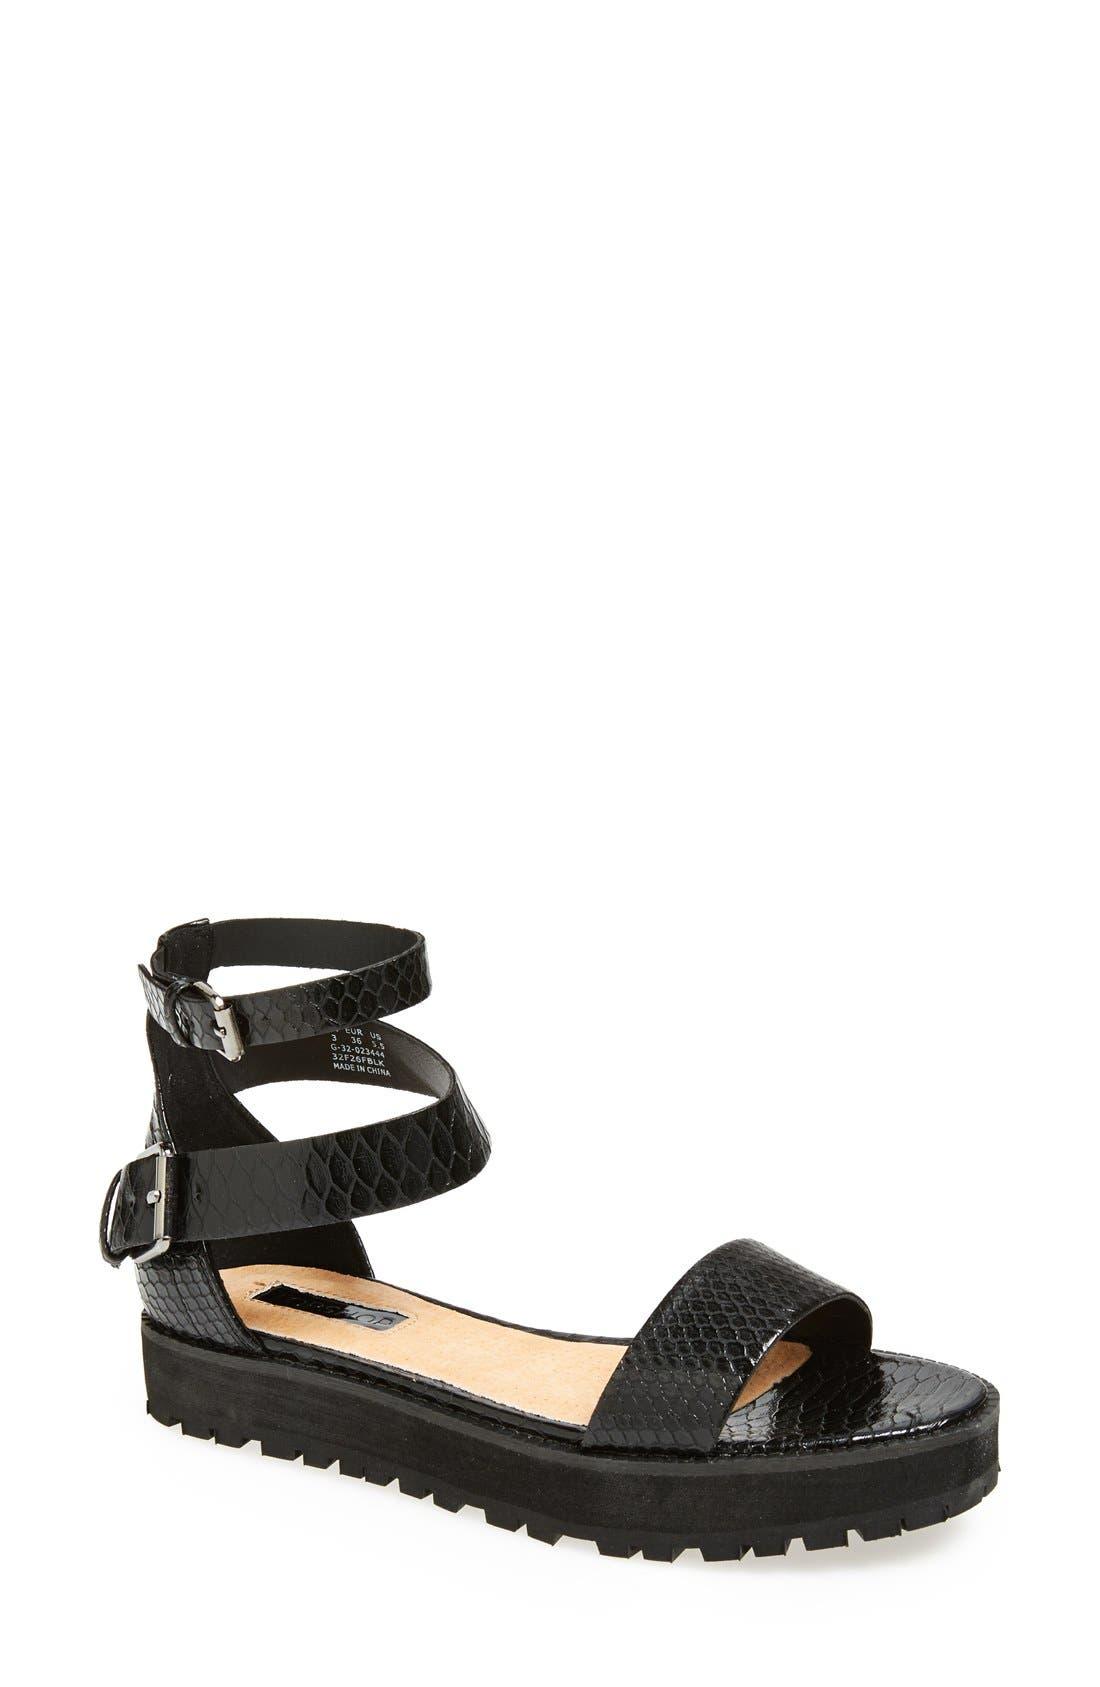 Alternate Image 1 Selected - Topshop 'Free Tread' Sandal